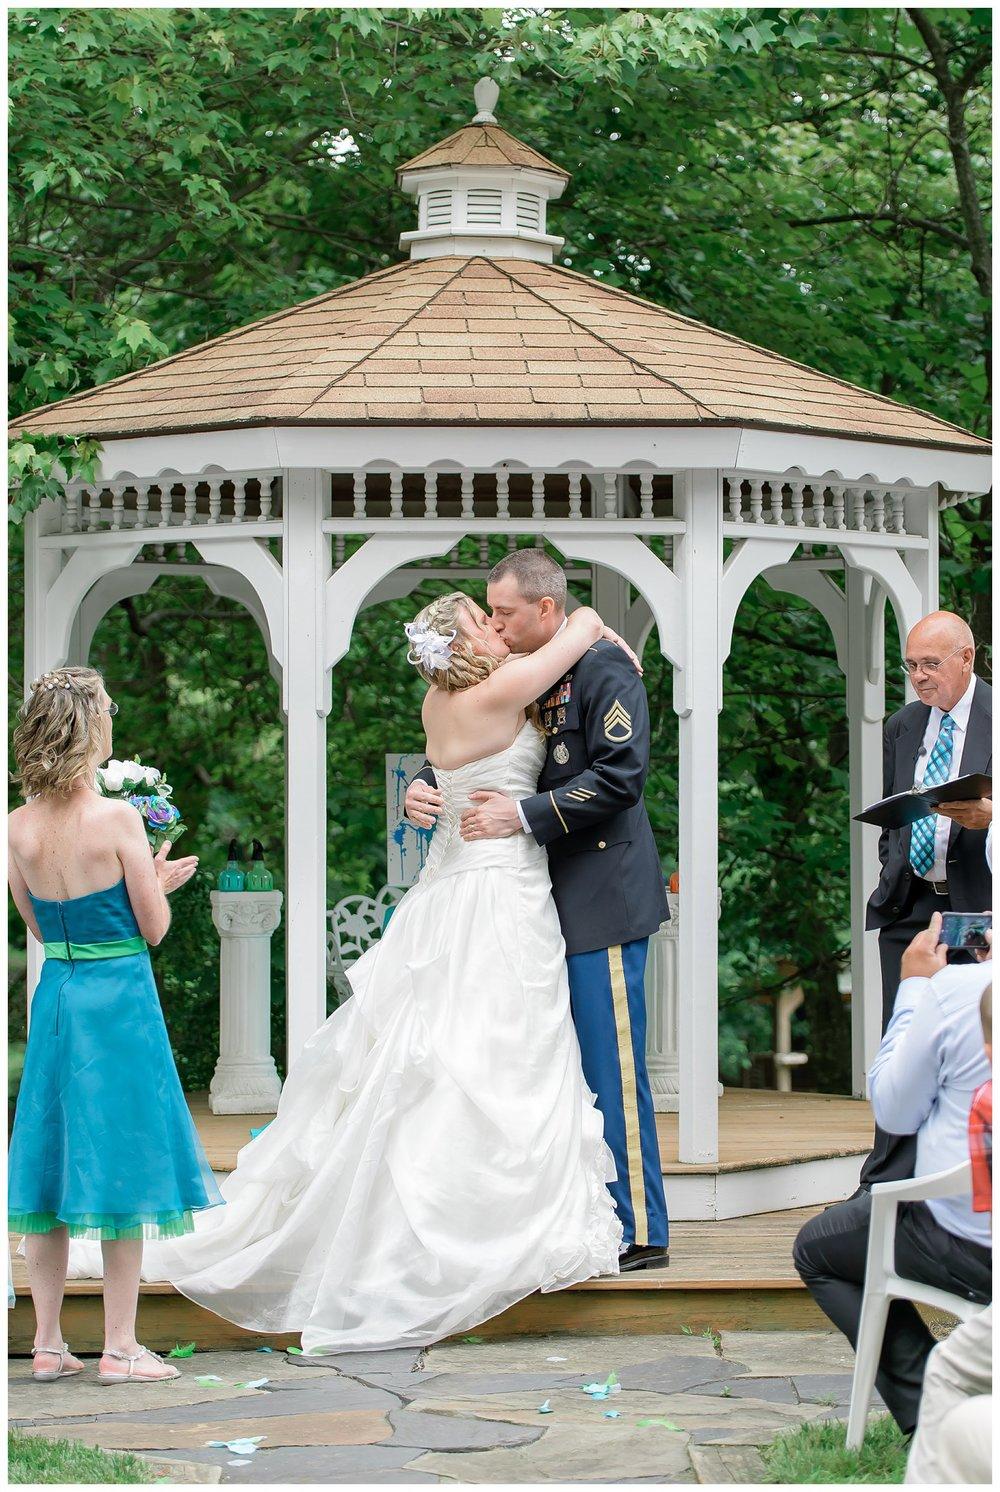 Katy_and_Jake_Married_Virginia Wedding Photographer_Stephanie Kopf Photography-212.jpg